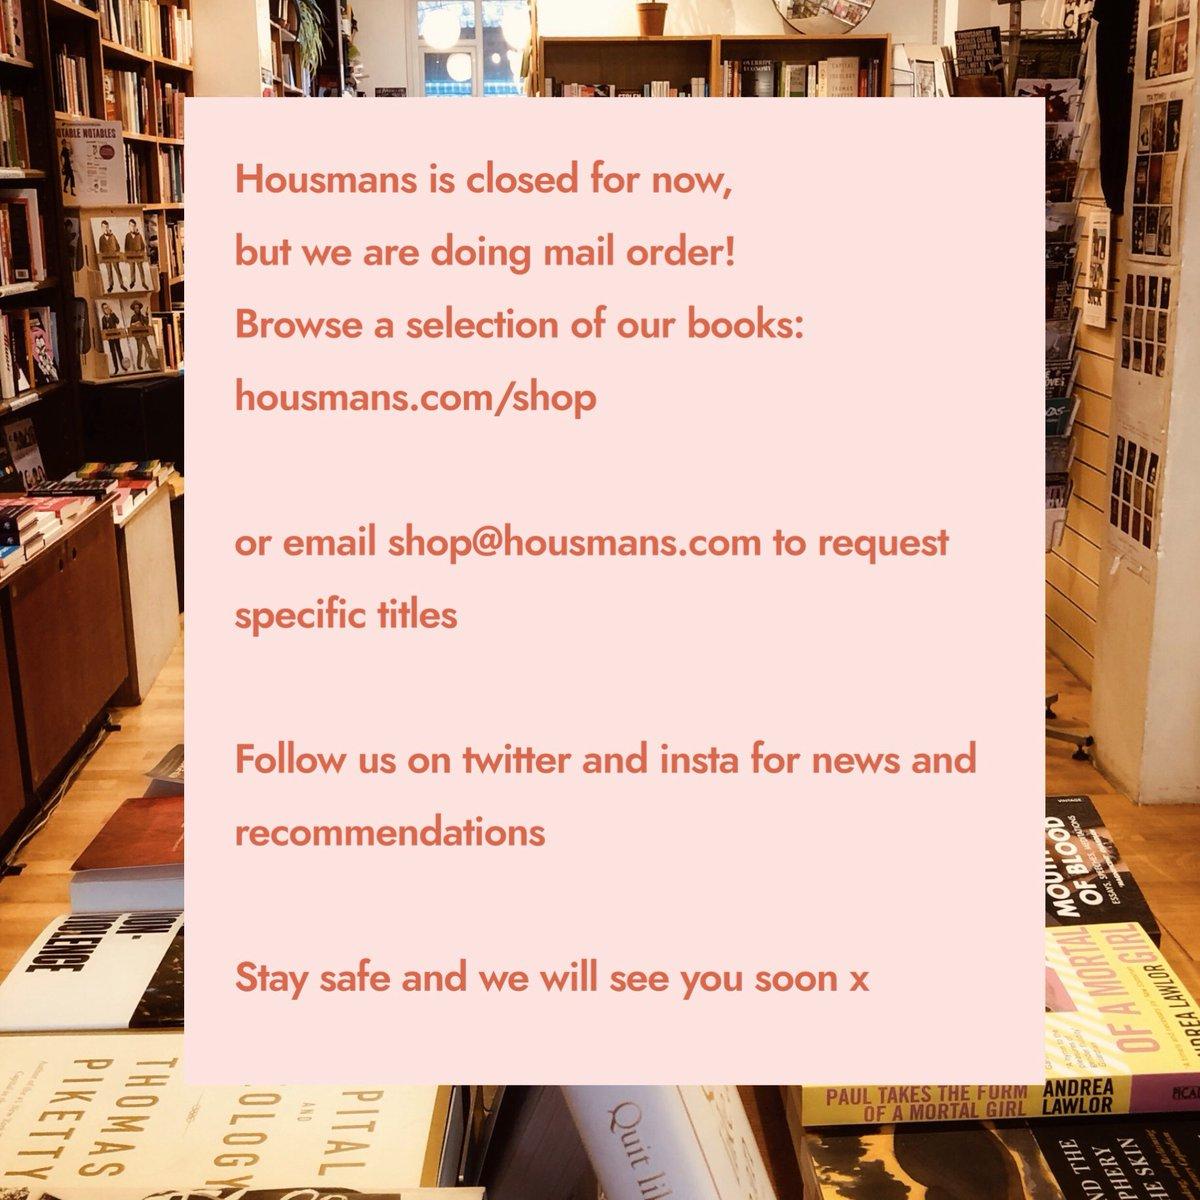 Housmans Bookshop (@HousmansBooks) on Twitter photo 23/03/2020 13:55:47